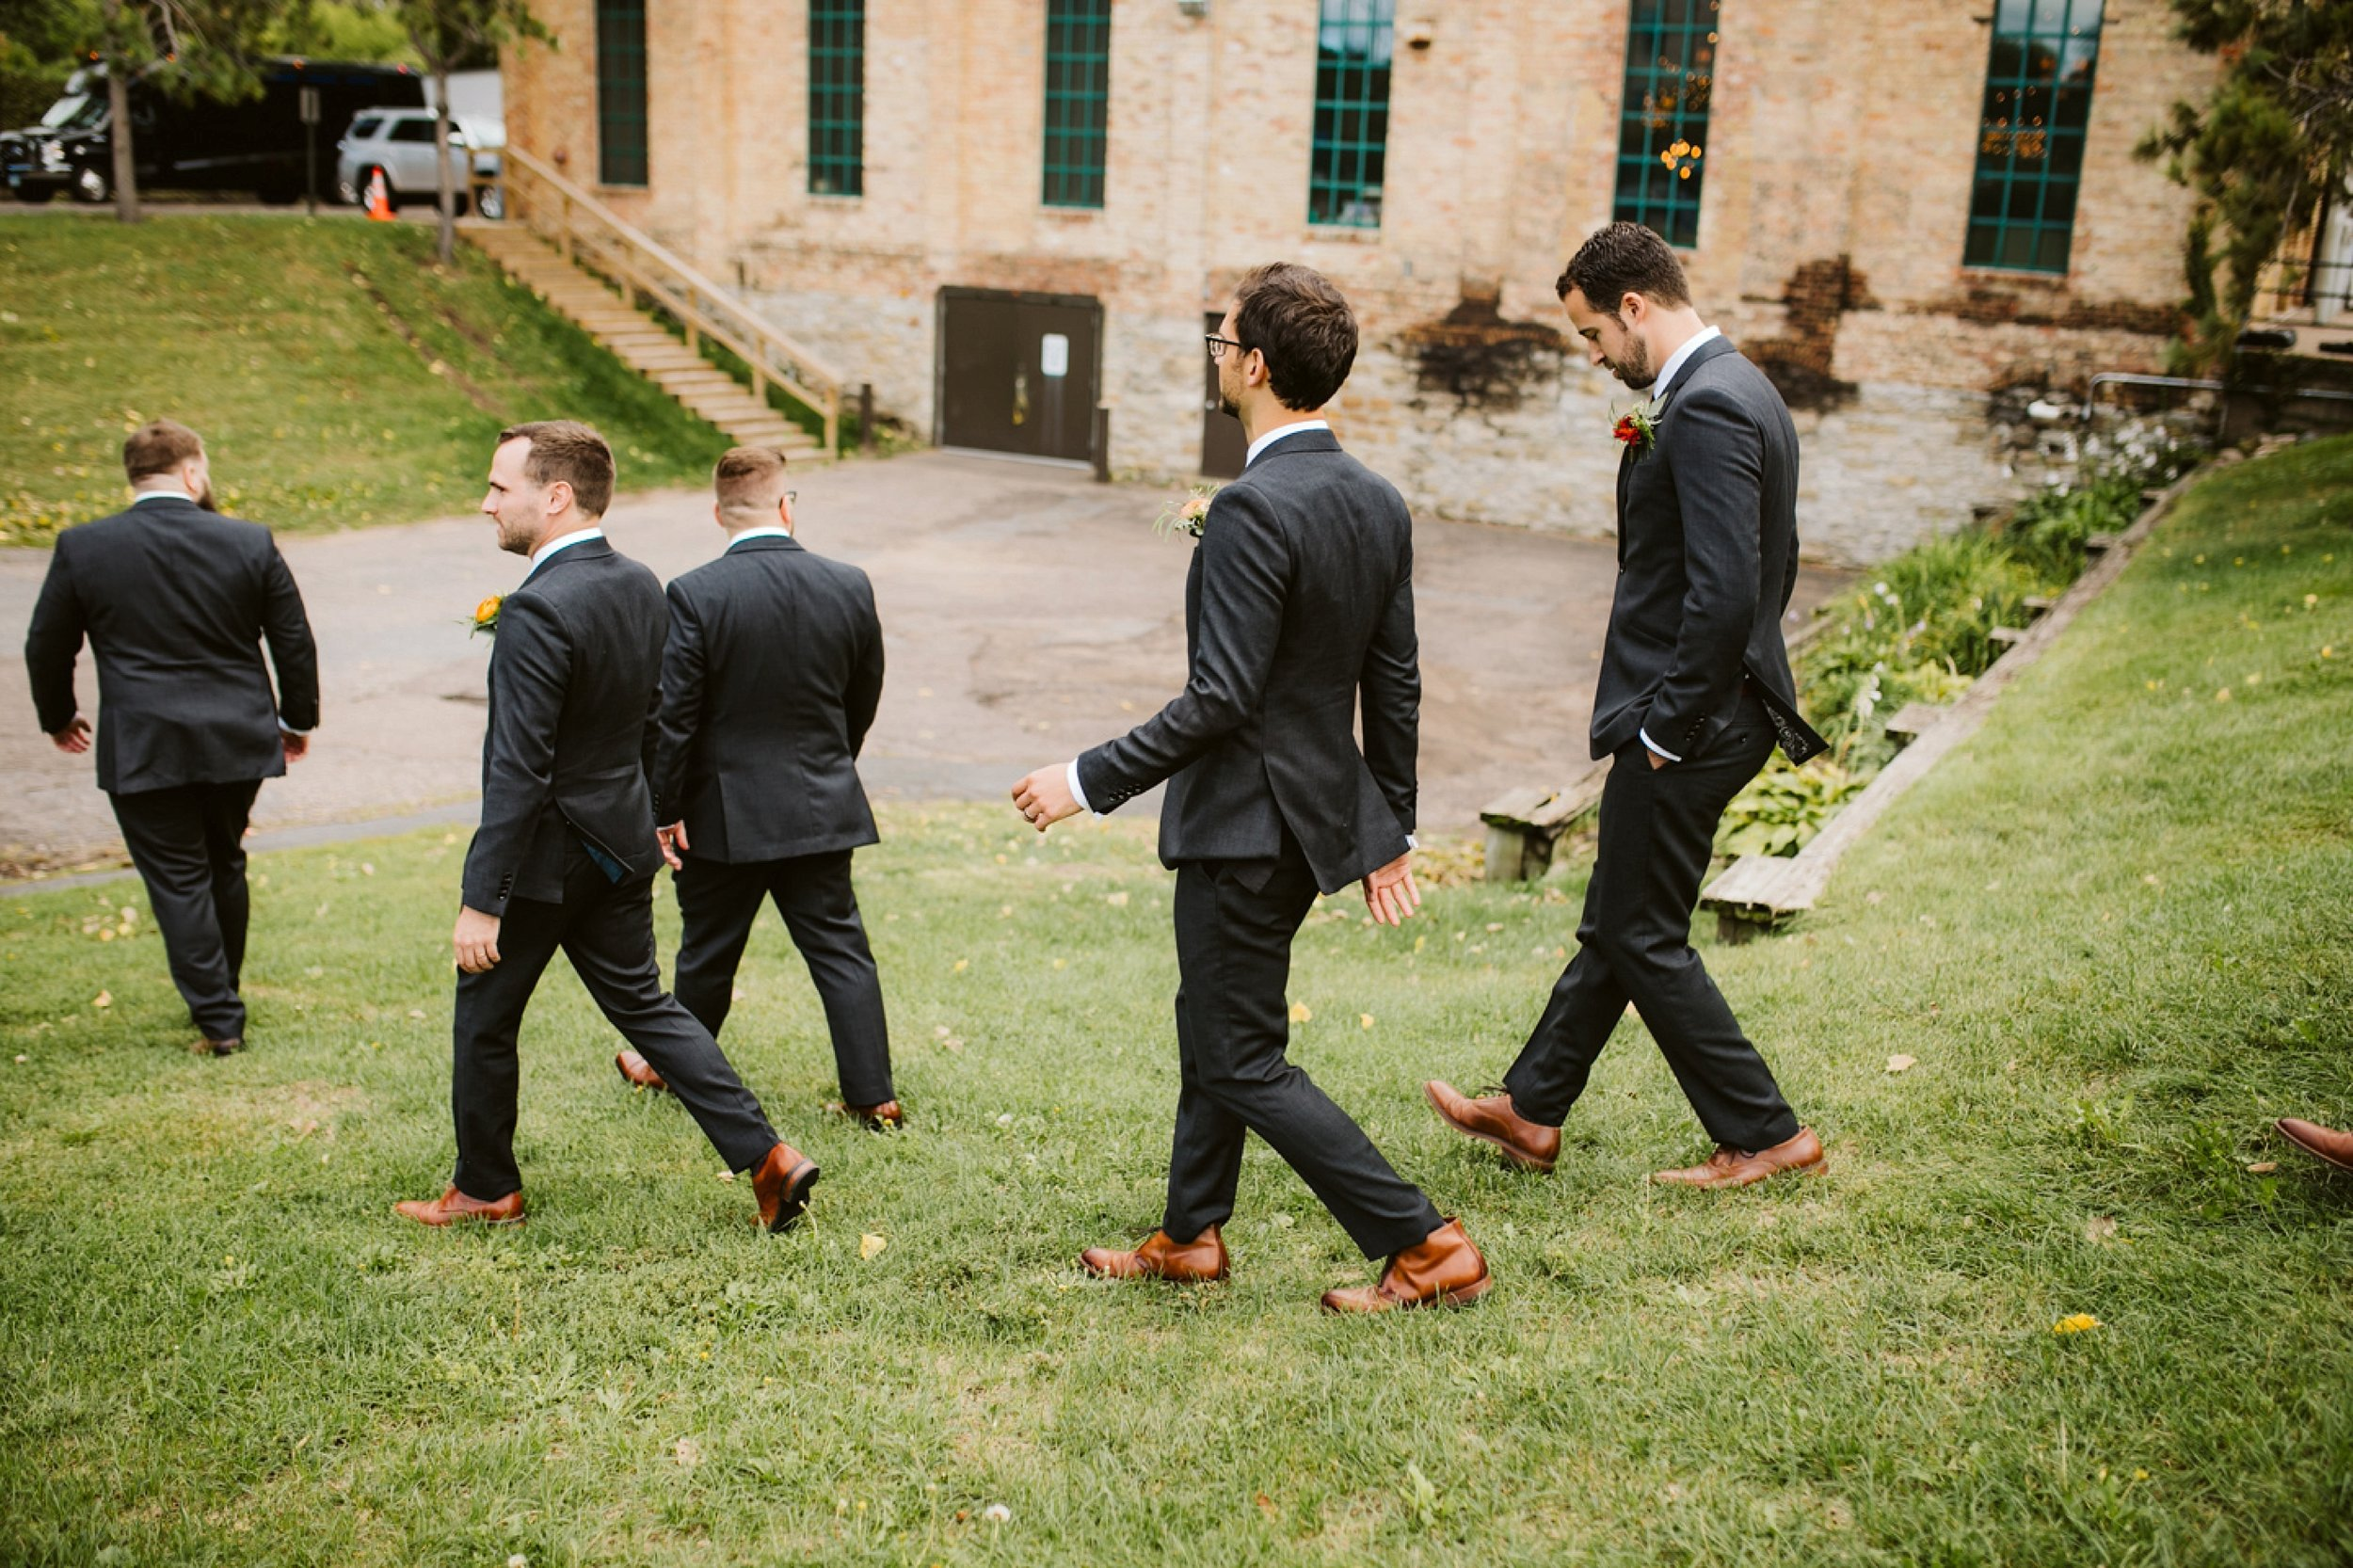 Nicollet-Island-Pavilion-Minneapolis-September-Coral-Navy-Wedding-75.jpg